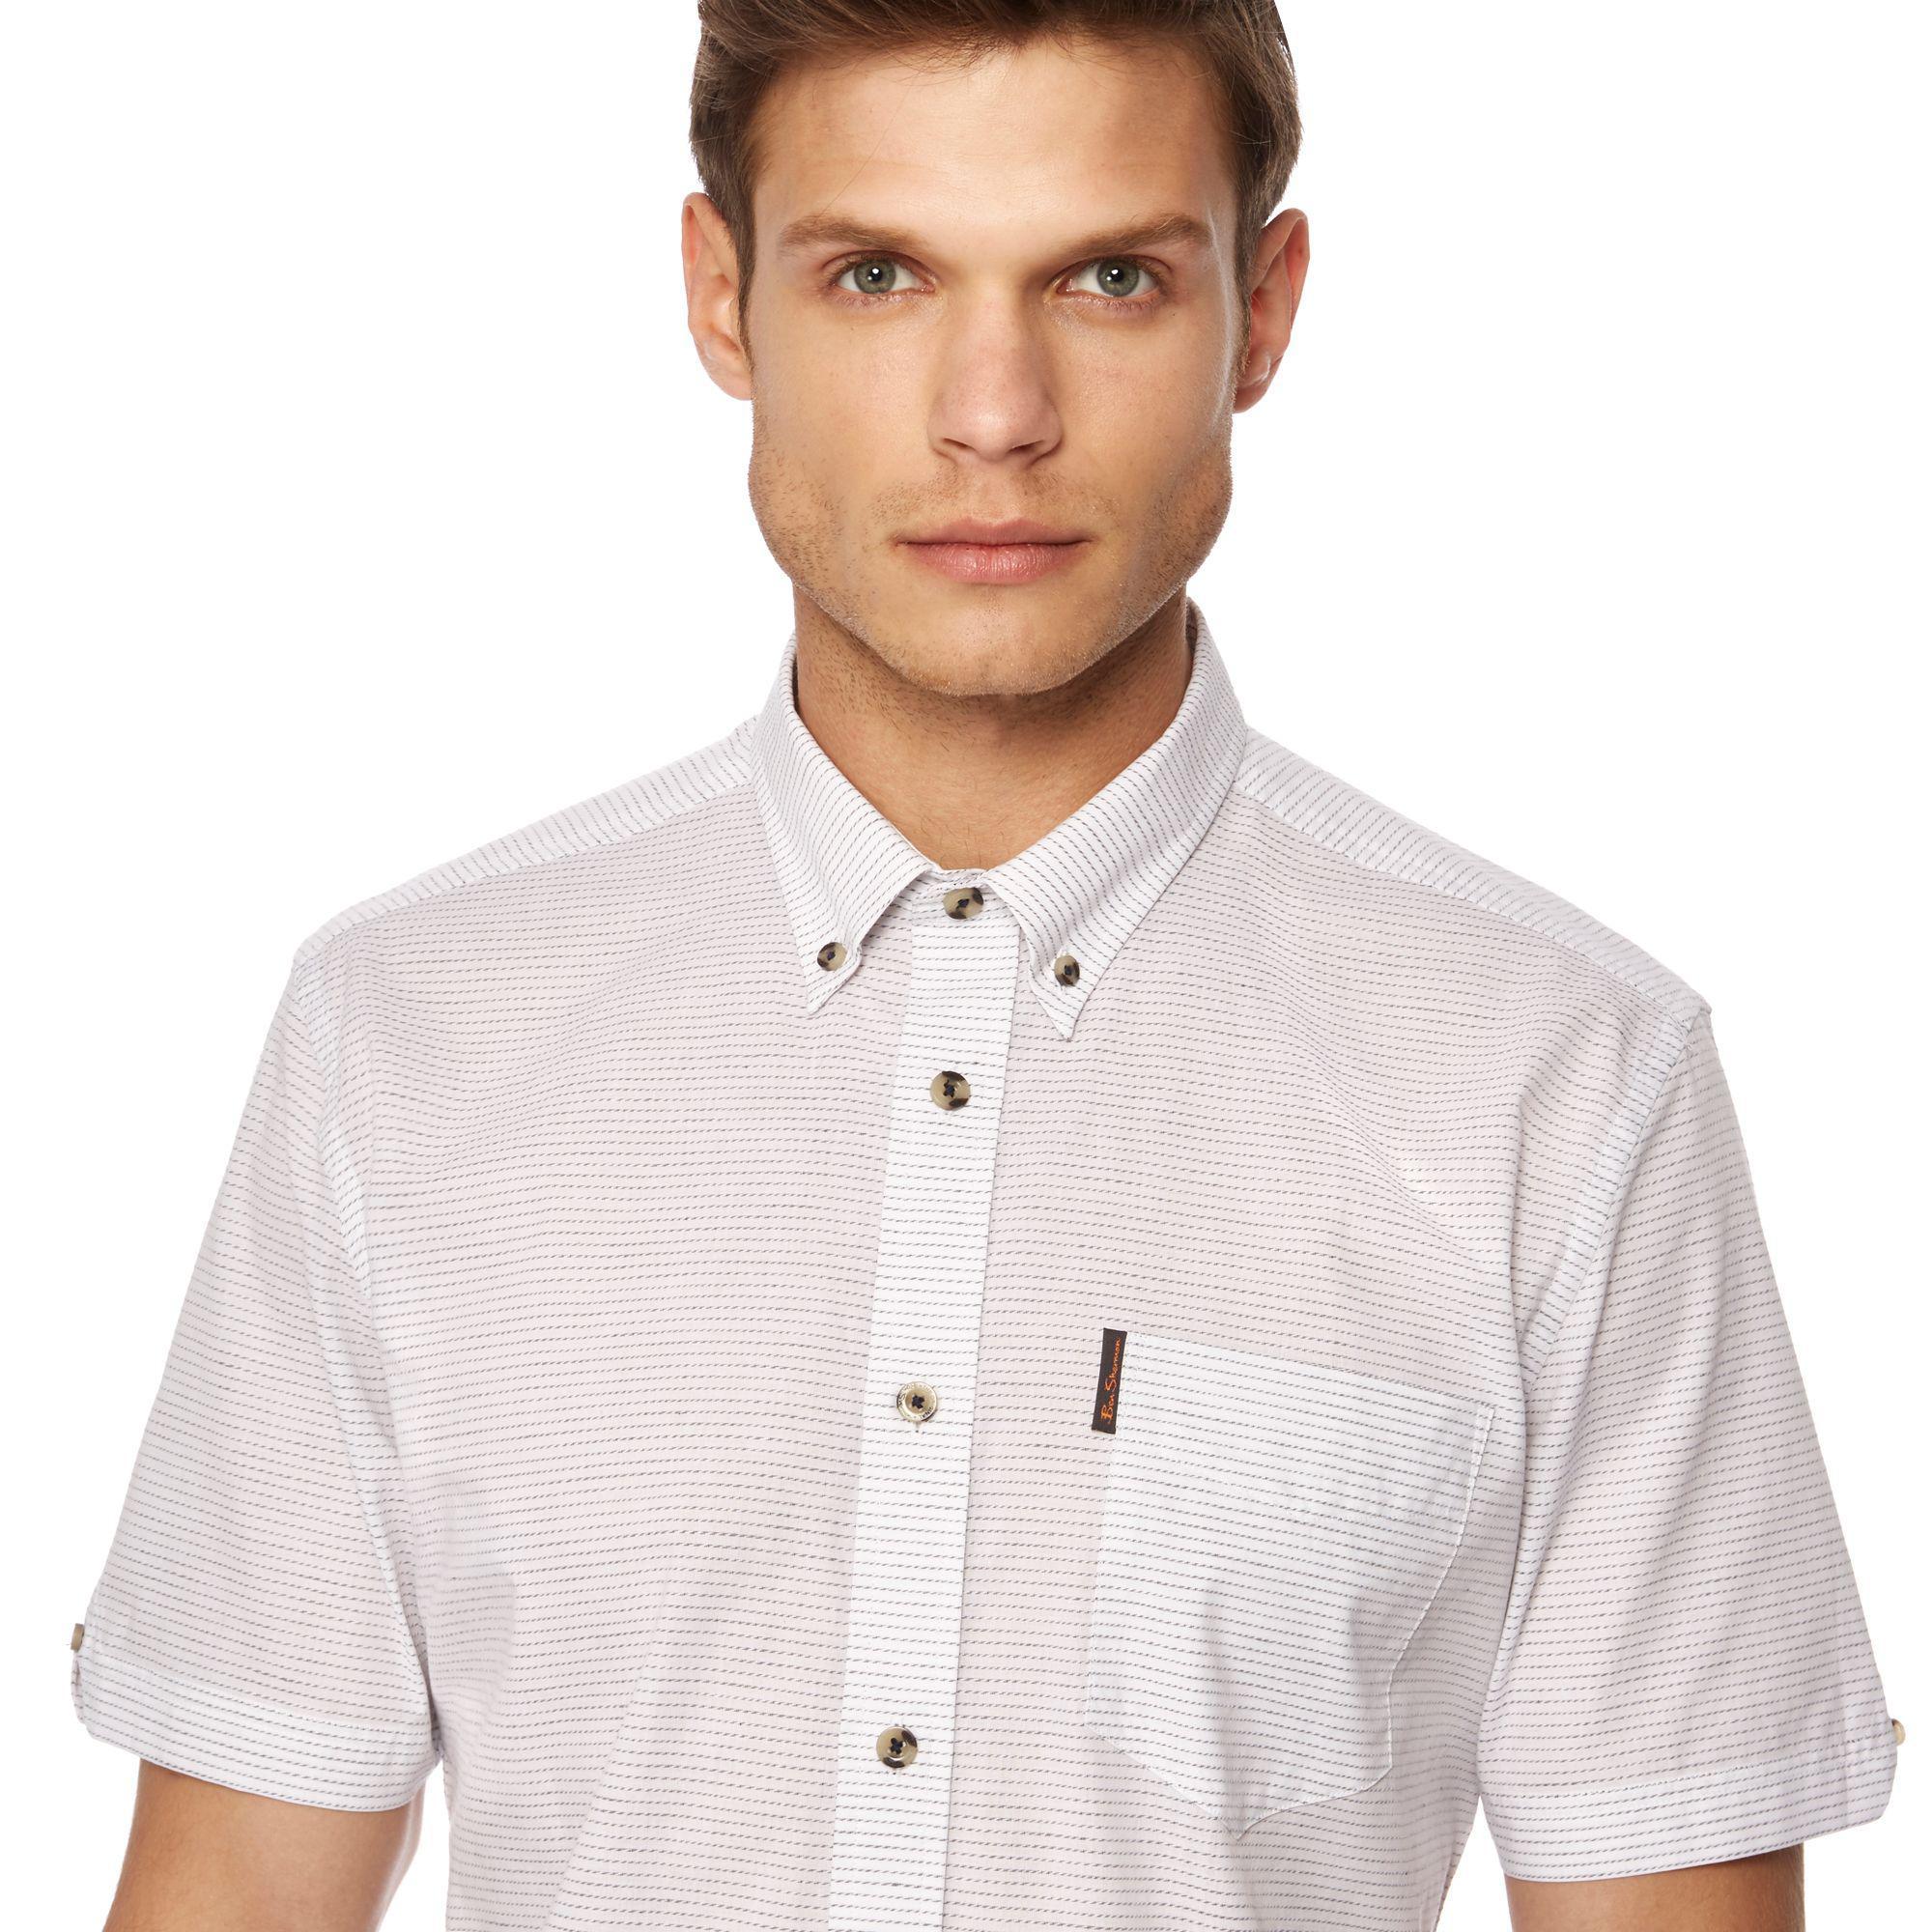 ce4a01c452 Ben Sherman - White Twisted Stripe Print Short Sleeve Shirt for Men - Lyst.  View fullscreen